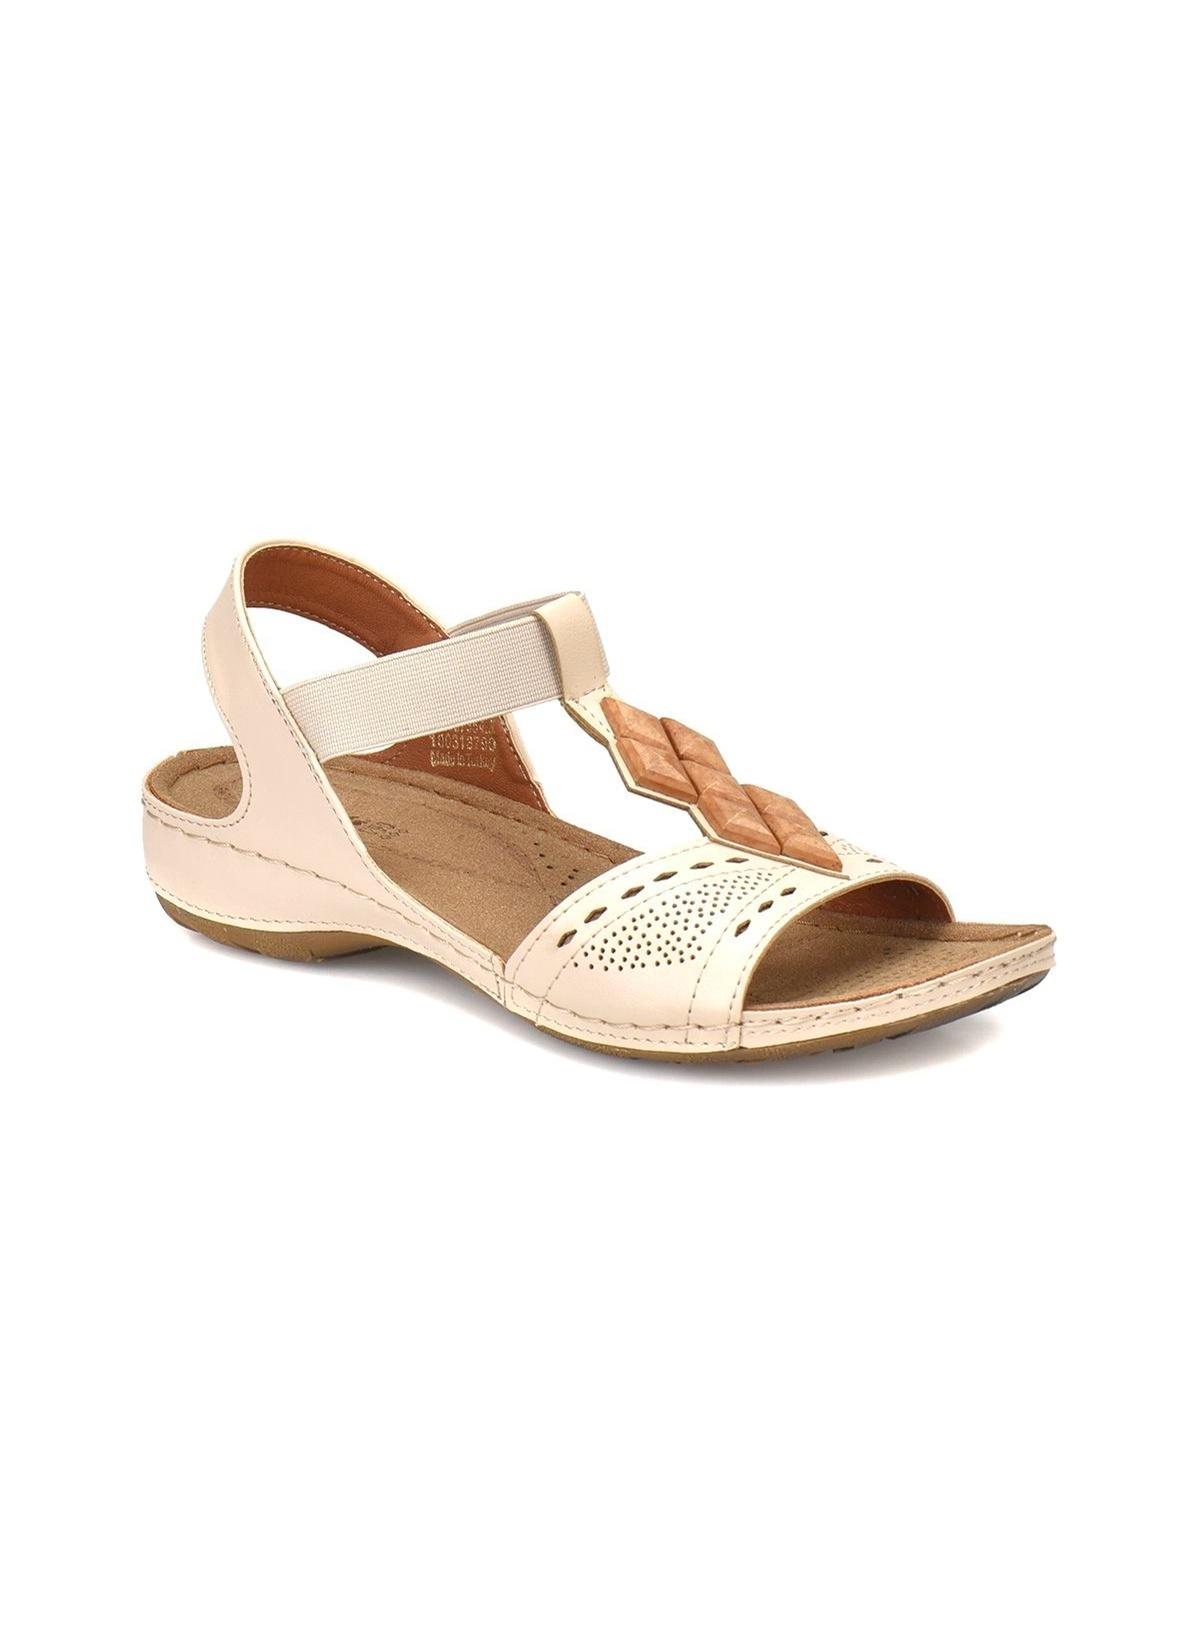 Polaris Sandalet 81.157364.z Basic Comfort – 69.99 TL